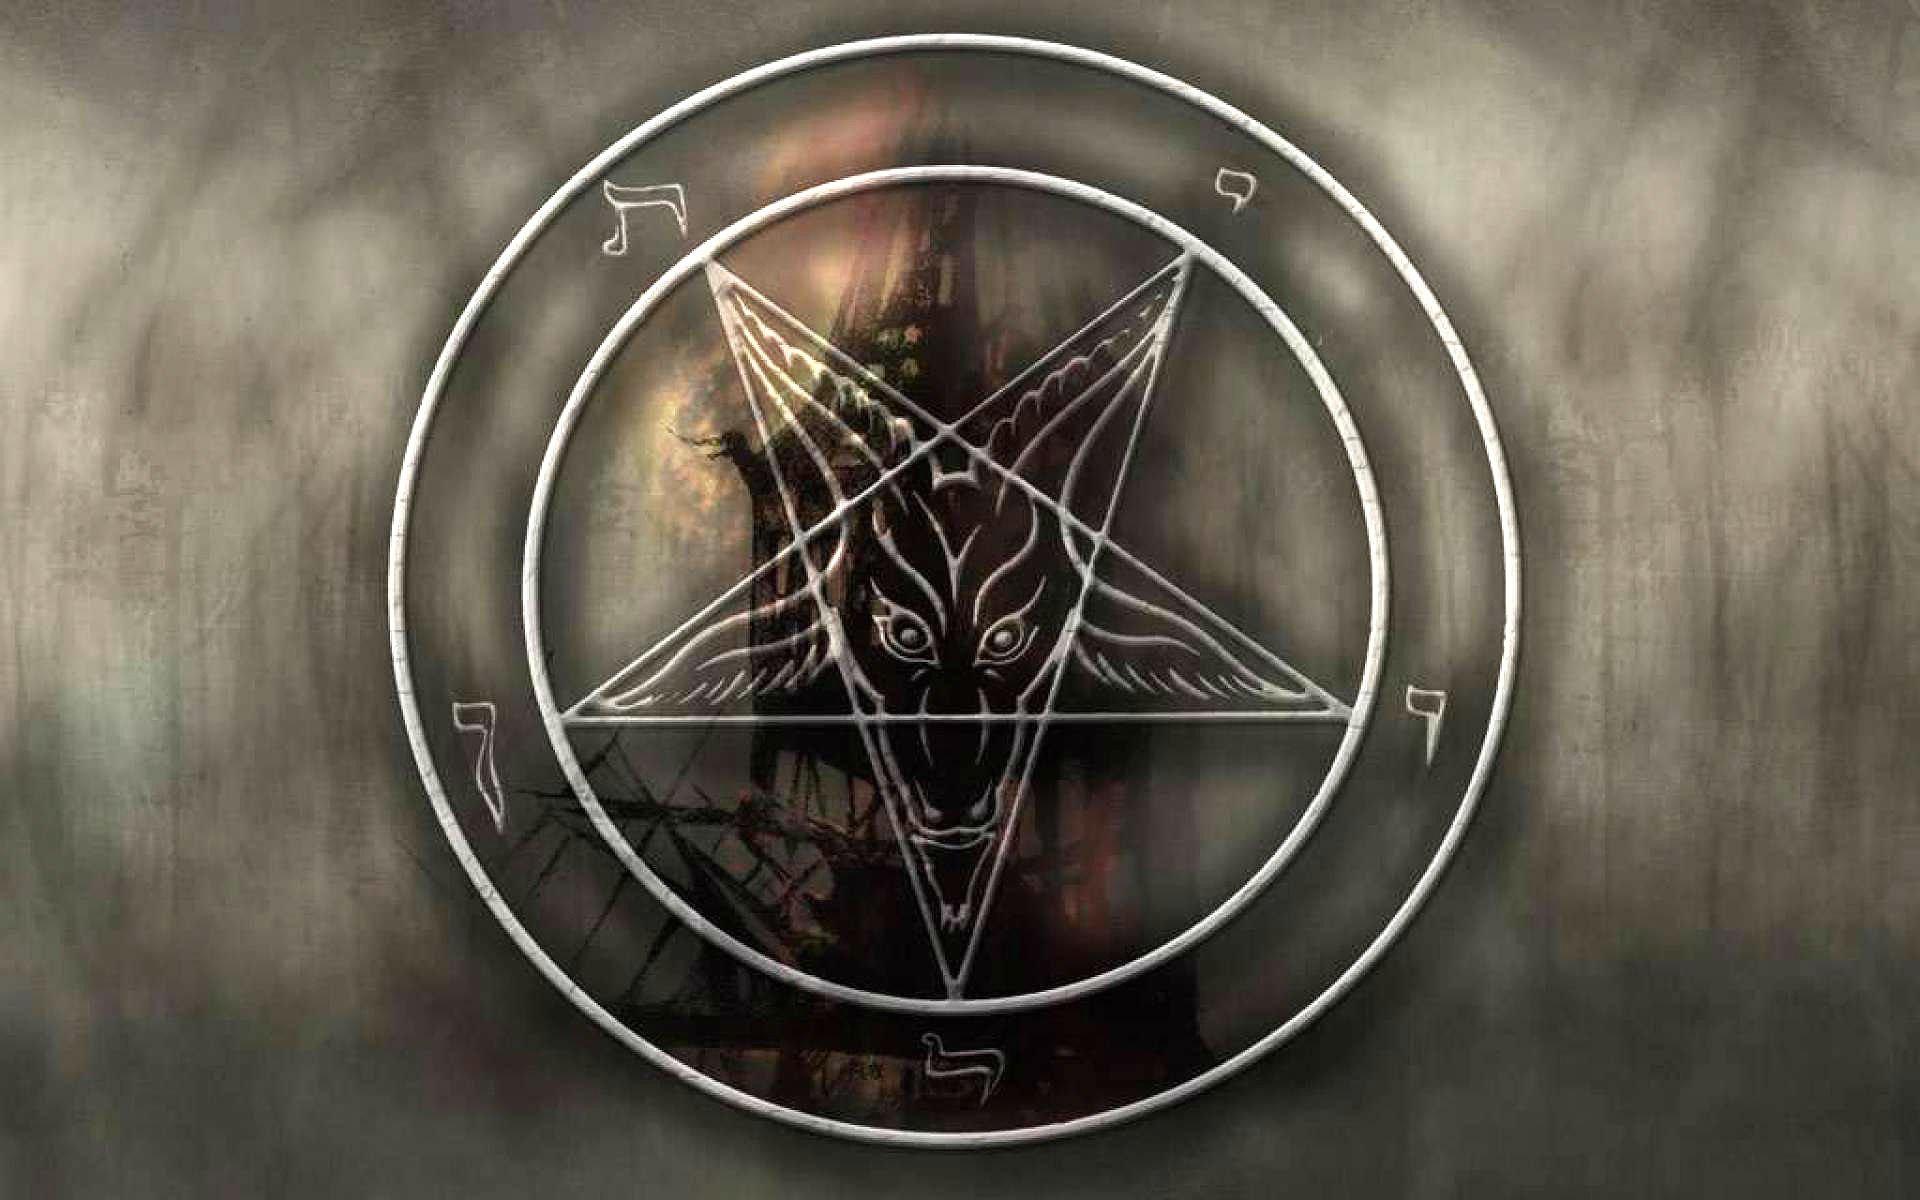 Wallpaper 1920x1200 Px Dark Demon Evil Occult Satan